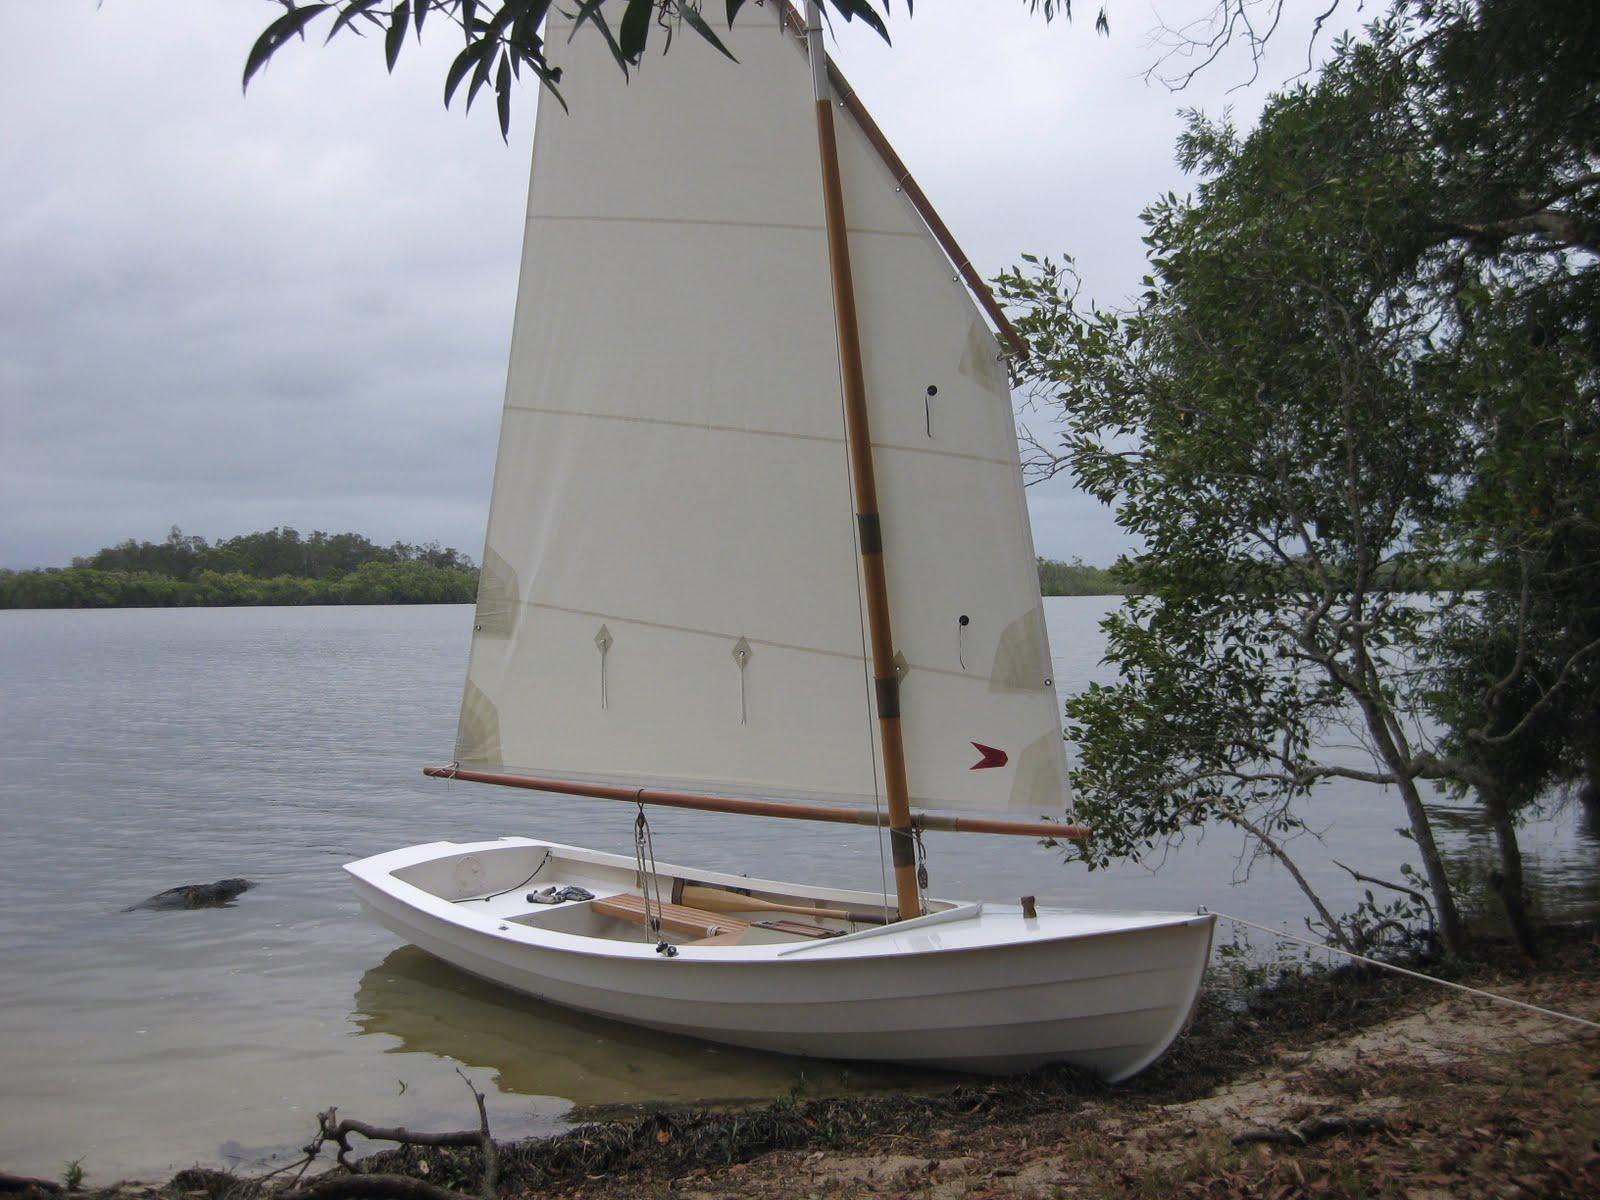 Ross Lillistone Wooden Boats: June 2011